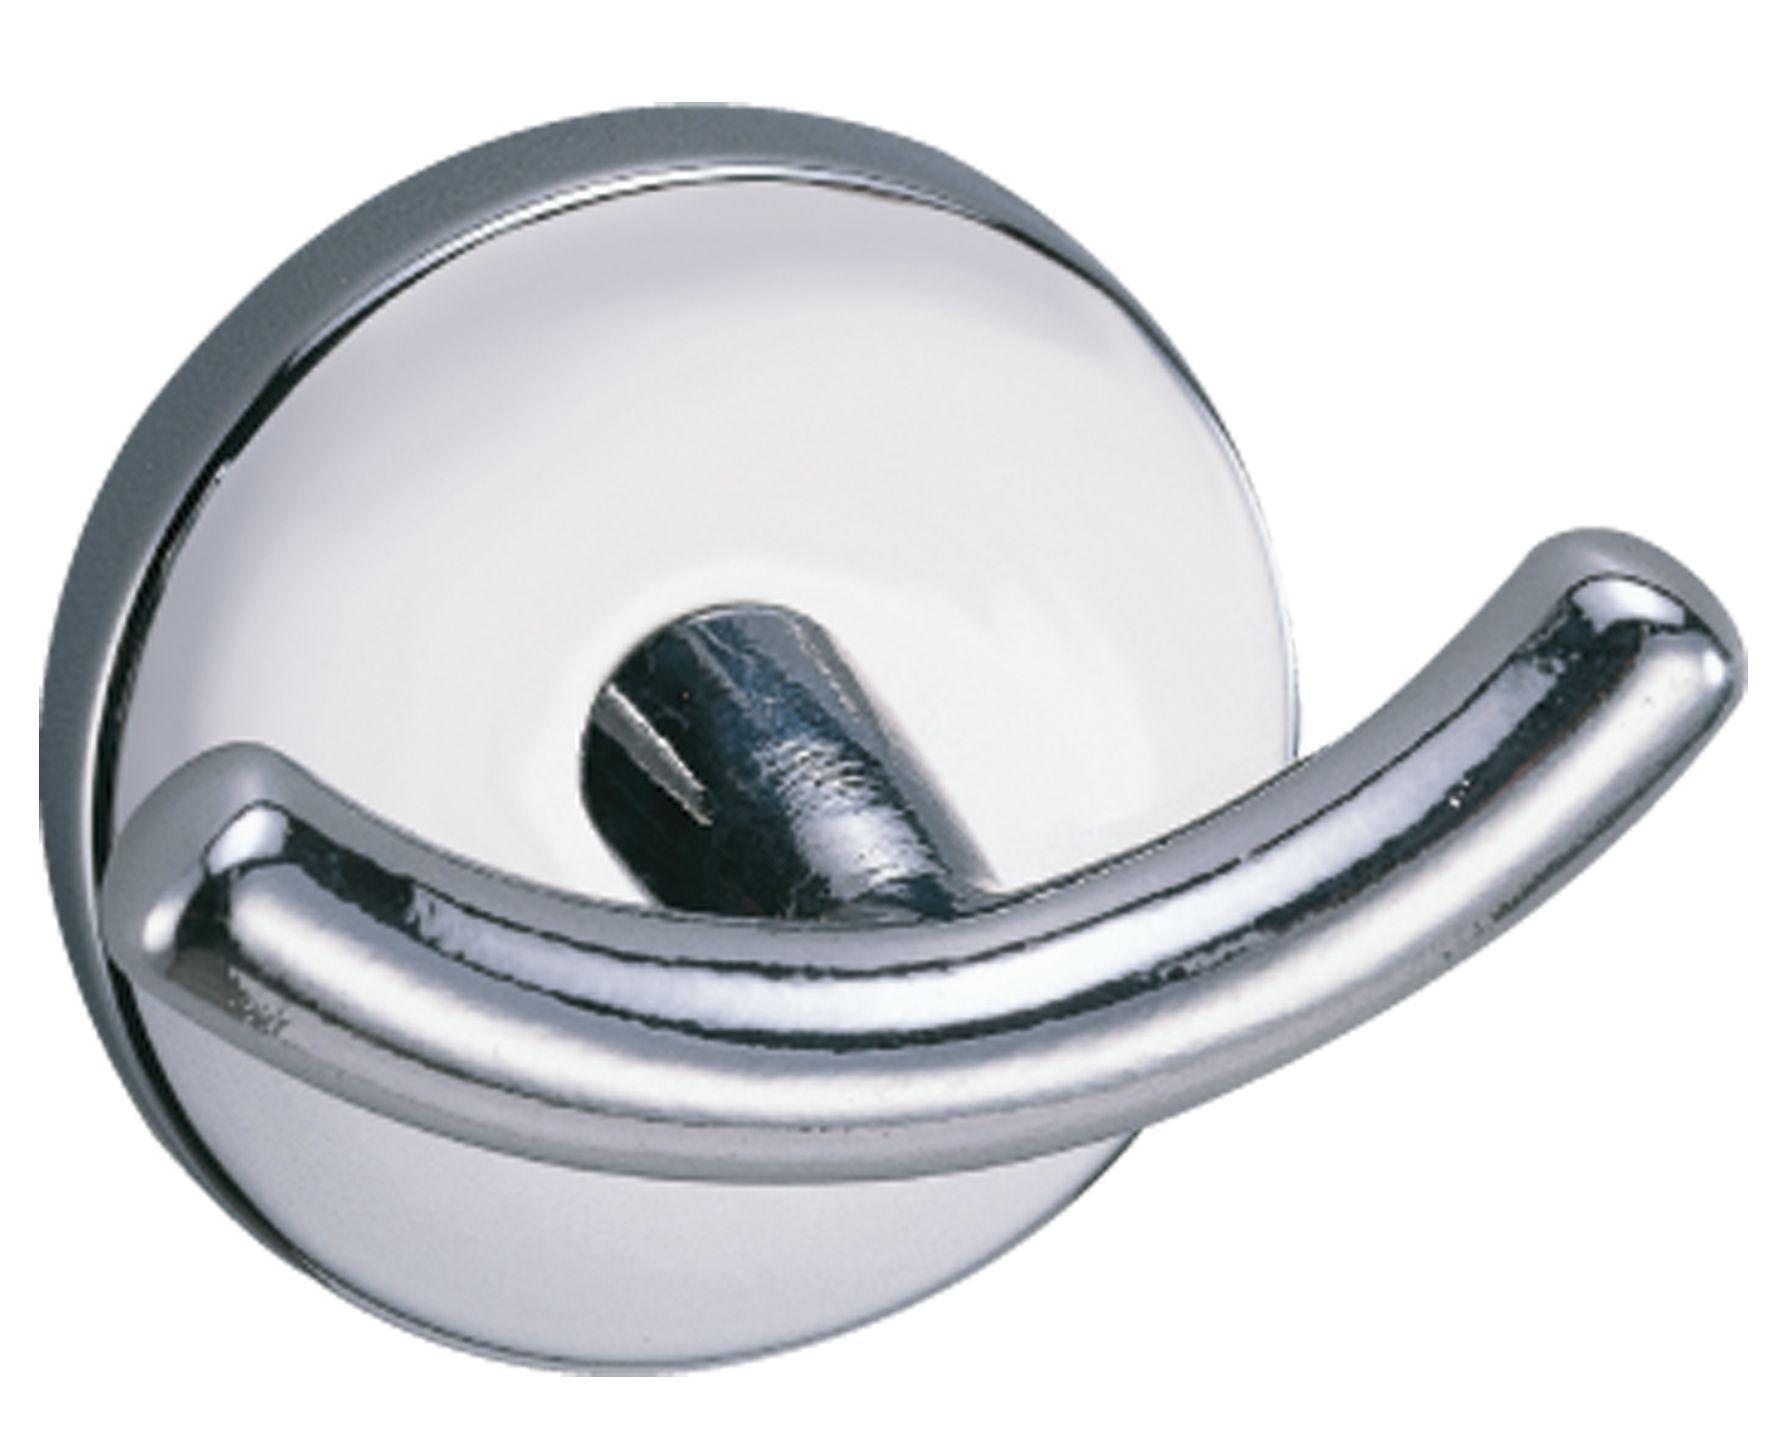 B&q Curve Silver Chrome Effect Double Hook